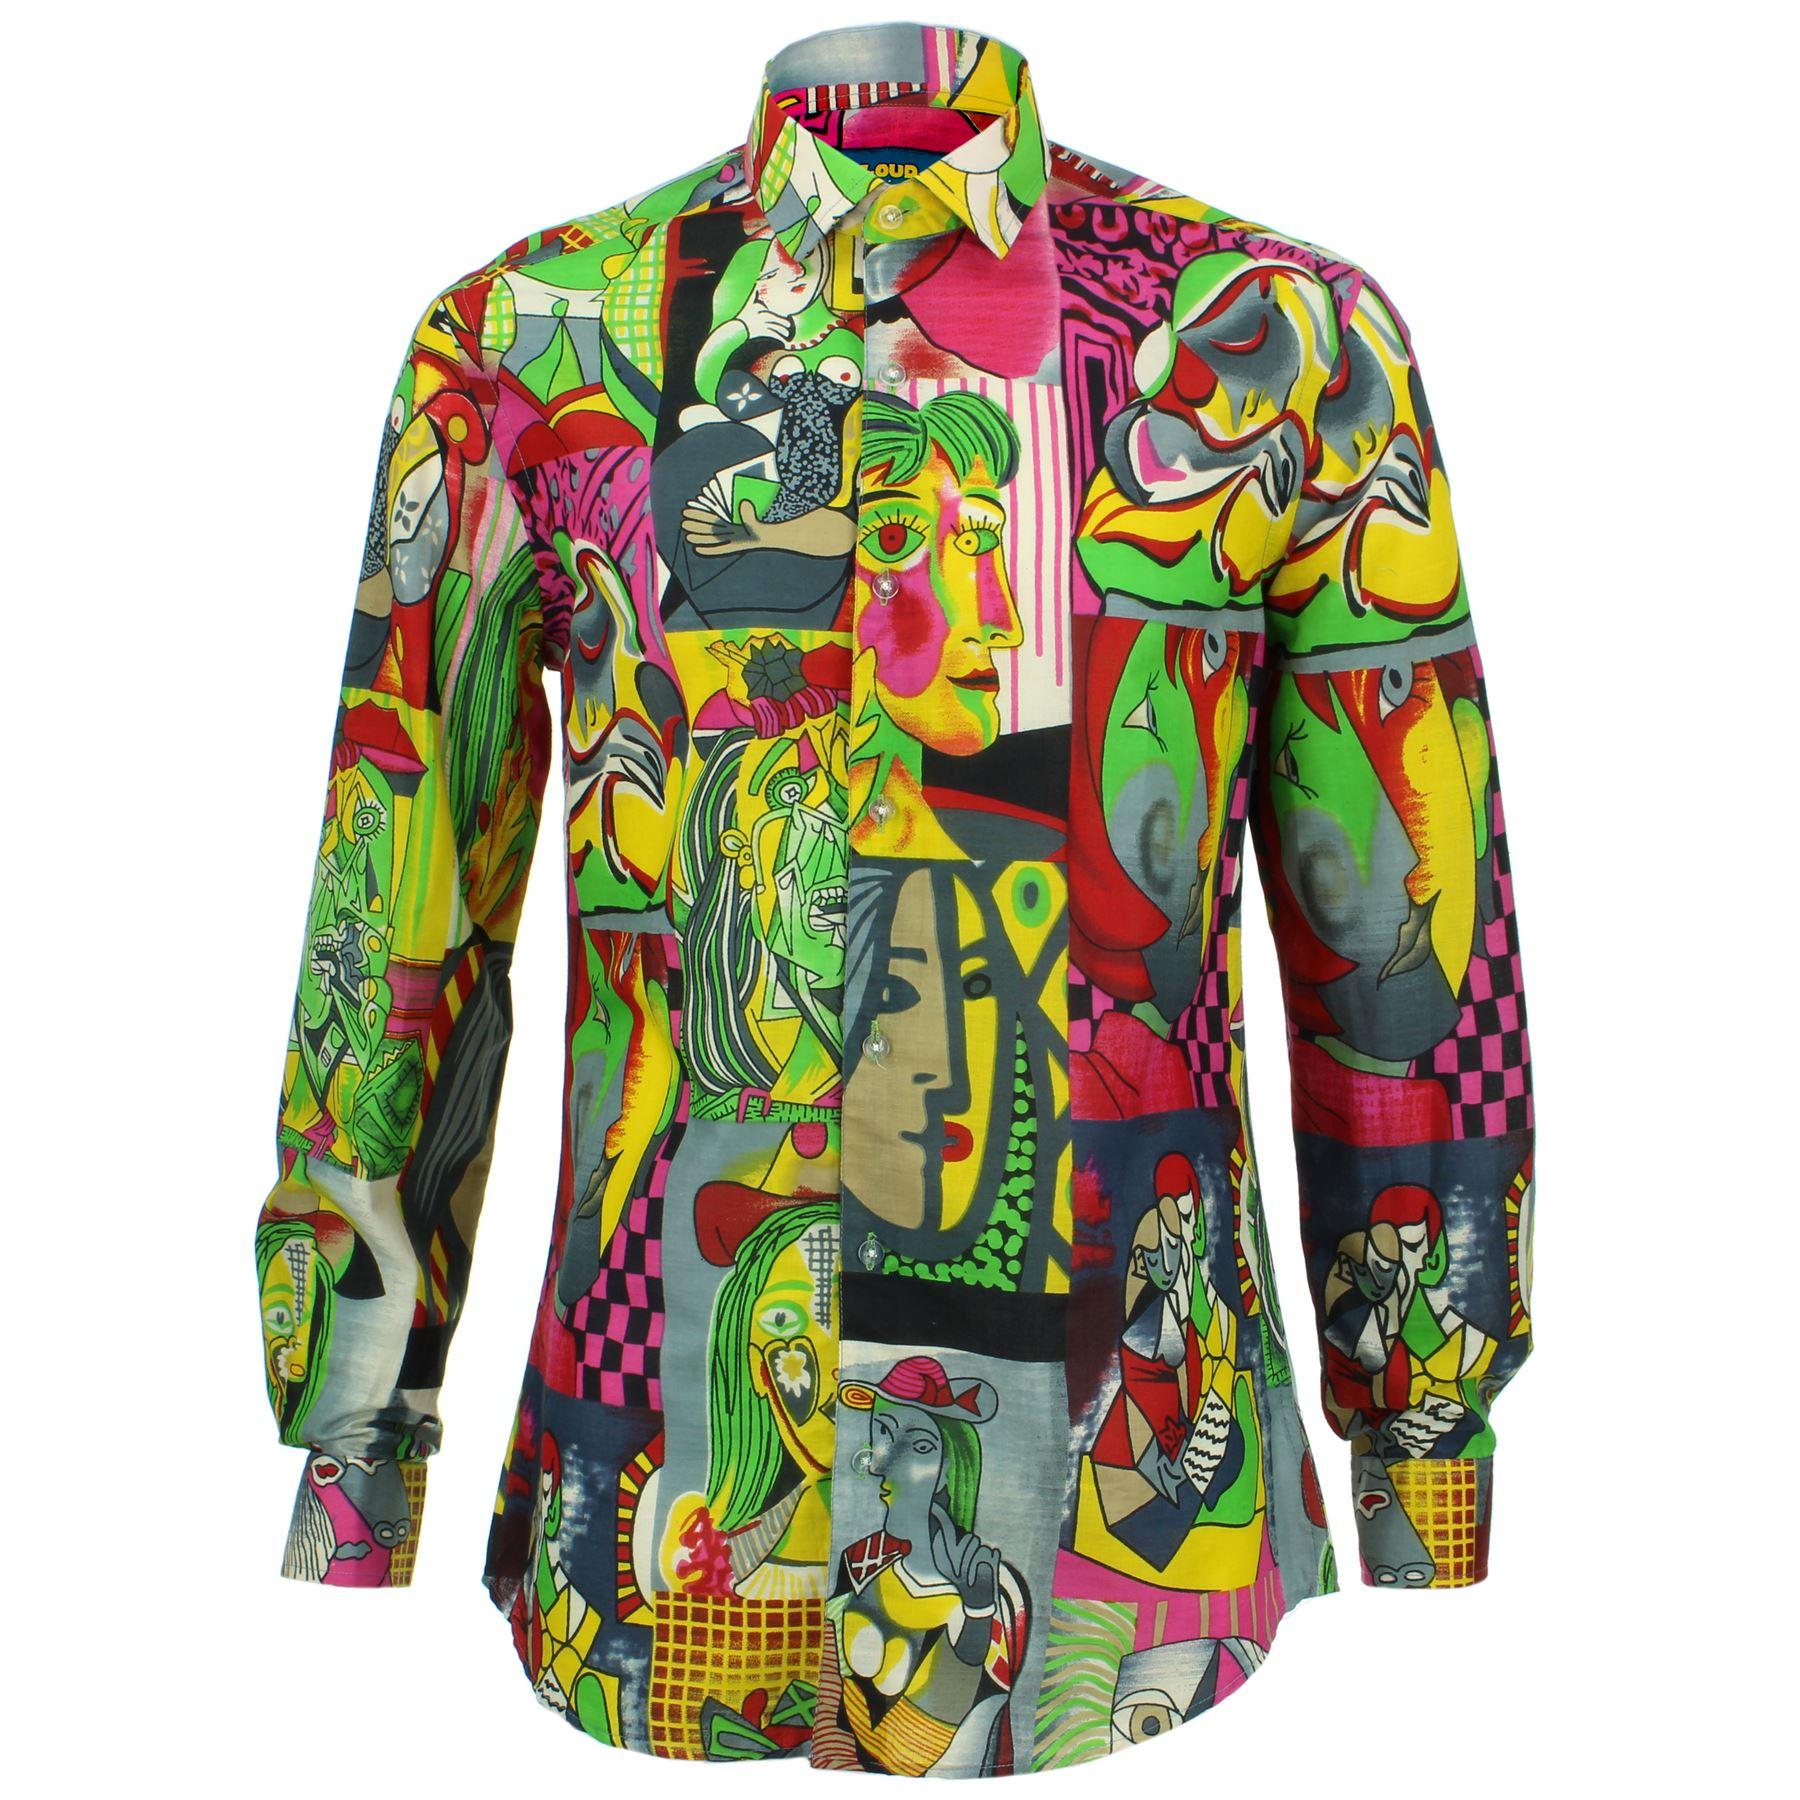 Herren Shirt Loud Originals Geschneidert Paisley Grün Retro Psychedelic Kostüm